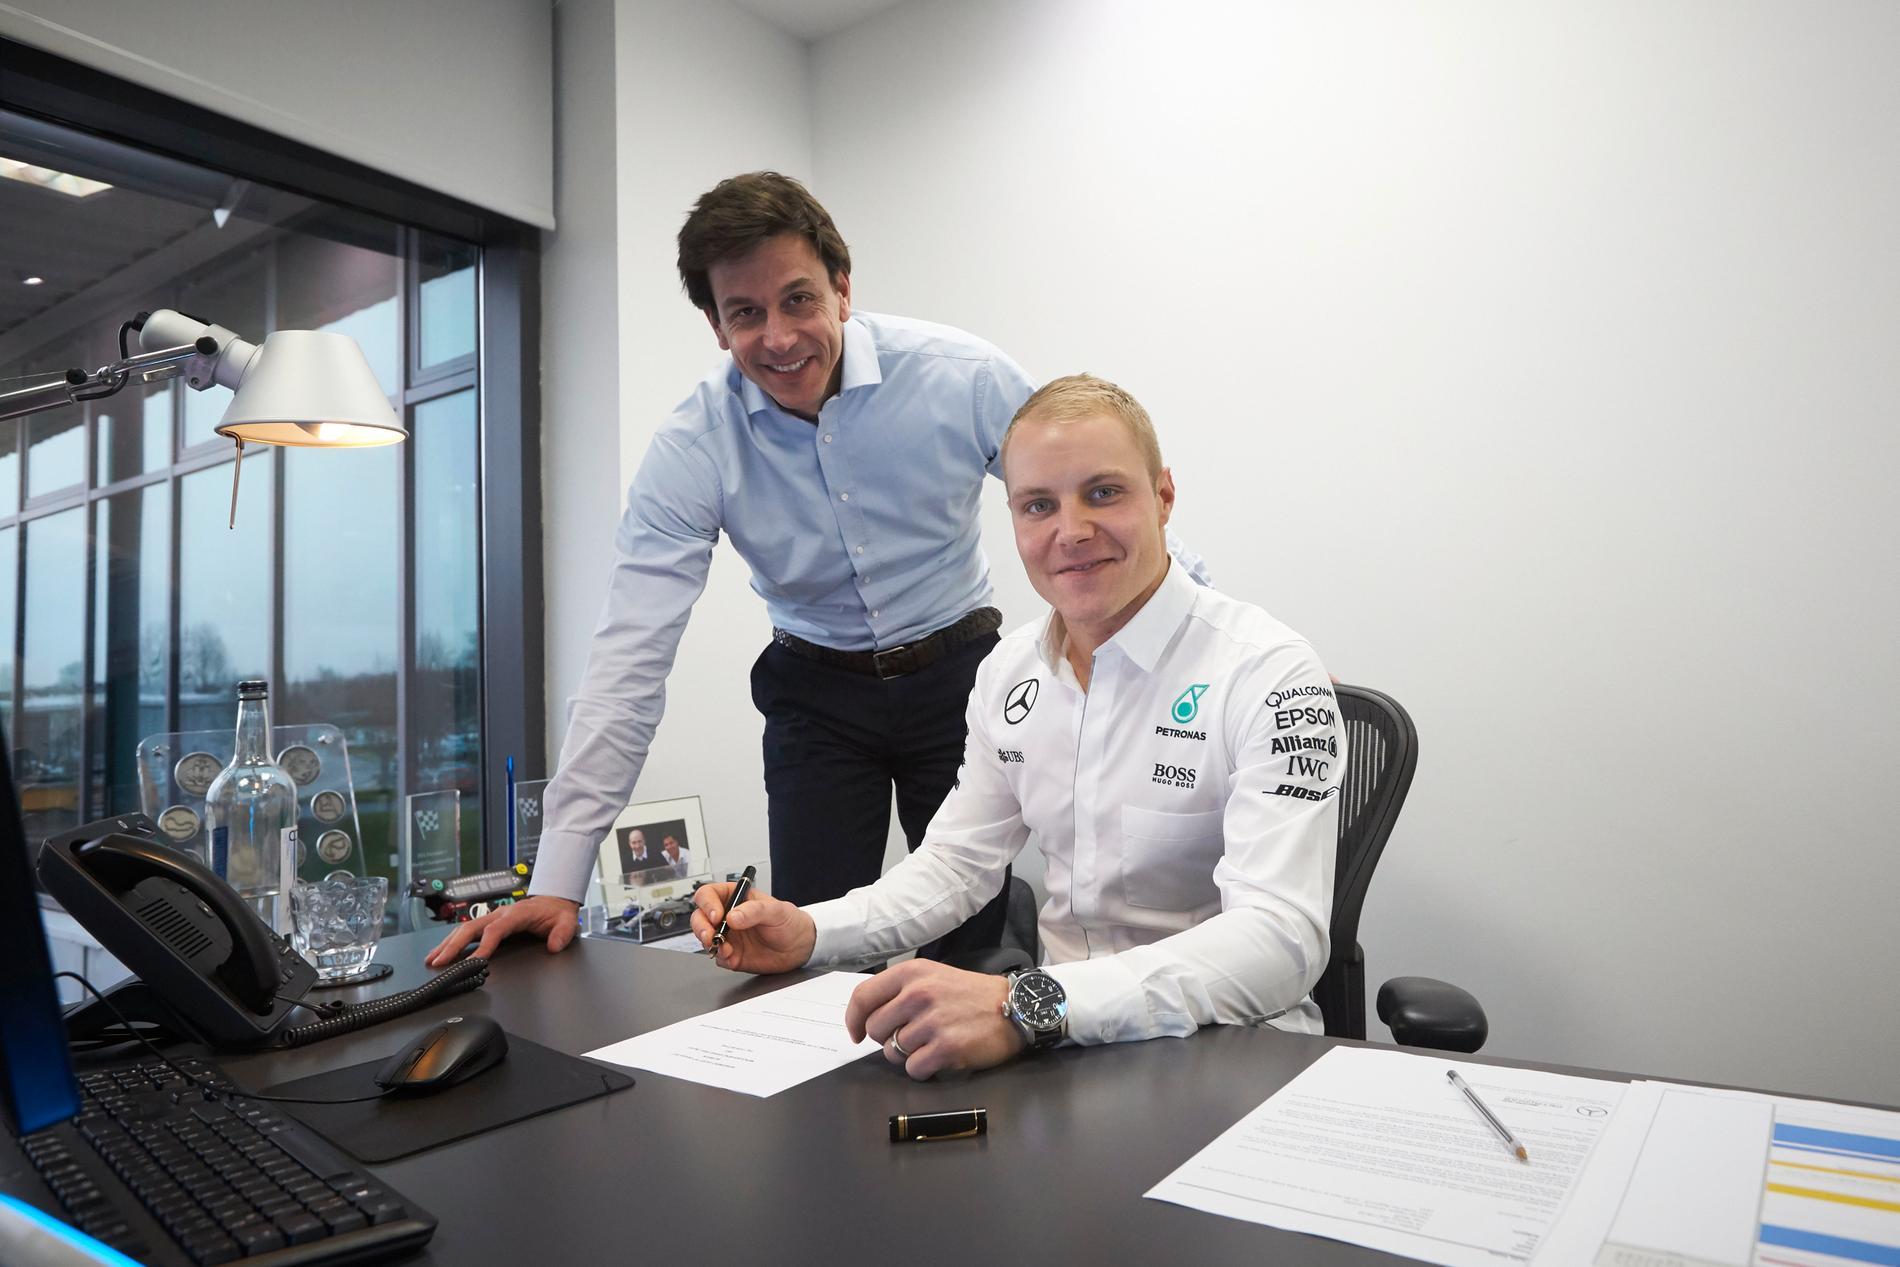 Valtteri Bottas och Mercedes teamchef Toro Wolff undertecknar kontraktet.